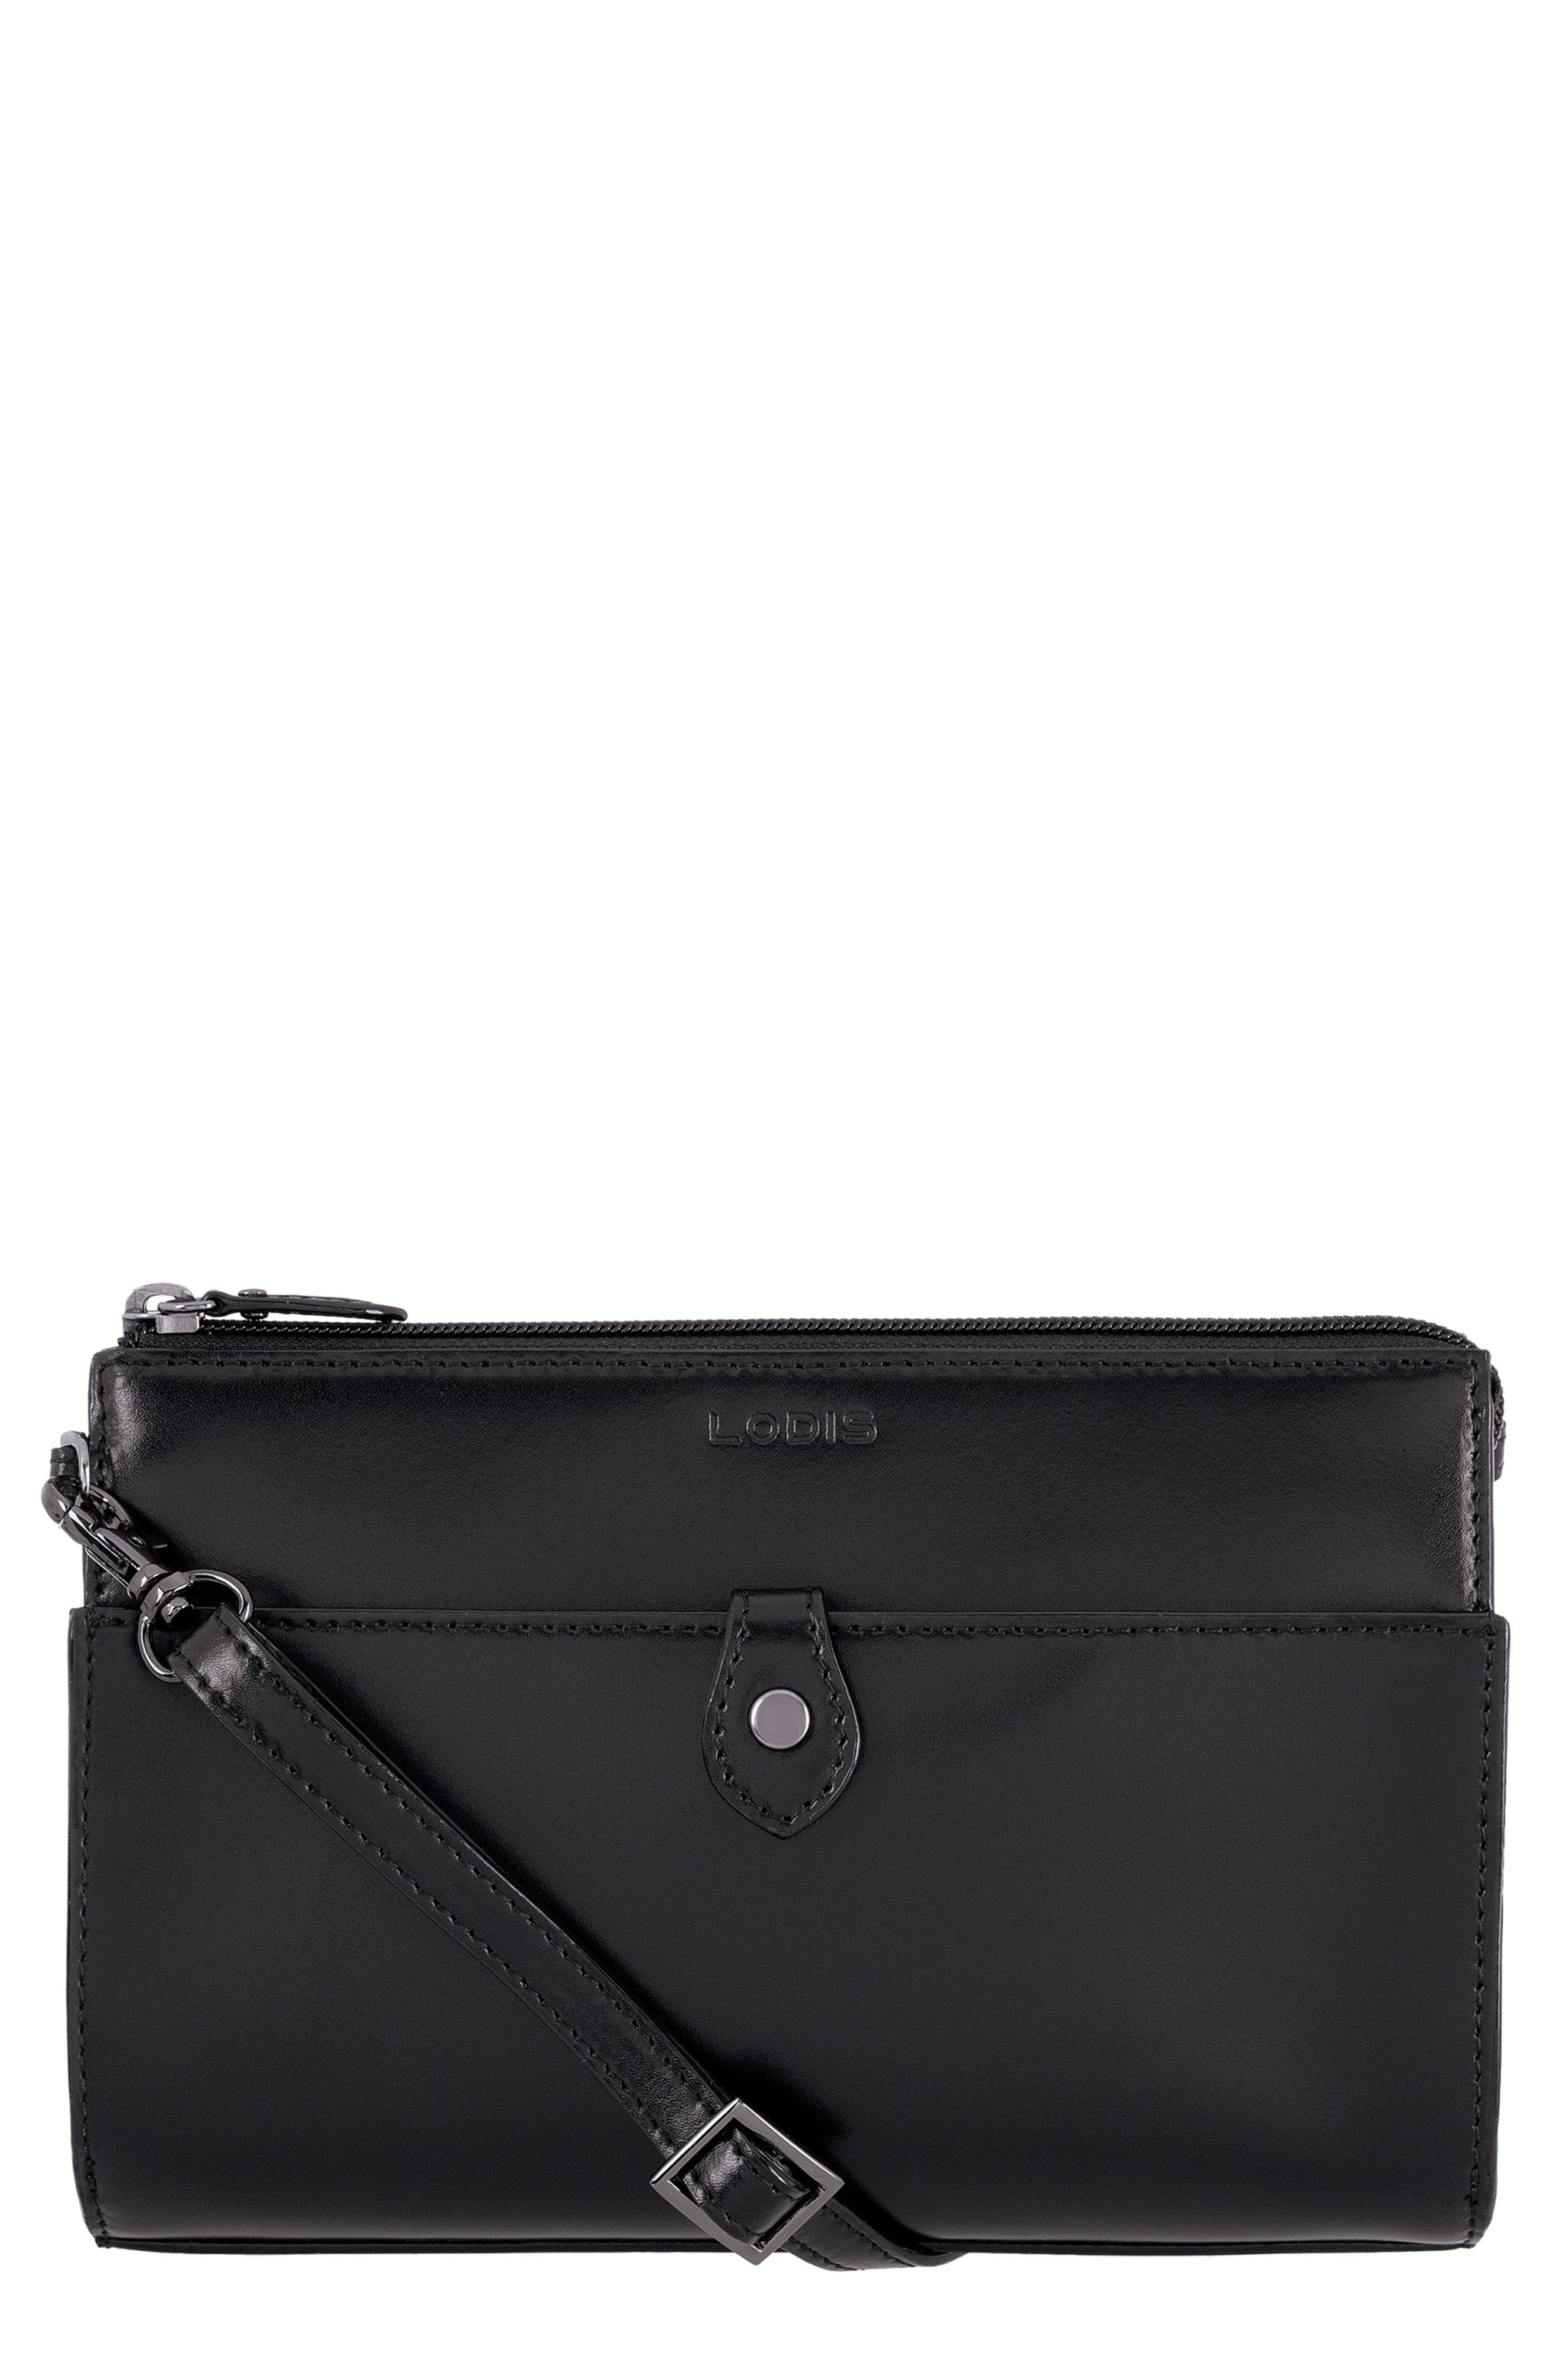 LODIS Los Angeles Audrey Under Lock & Key Vicky Convertible Leather Crossbody Bag